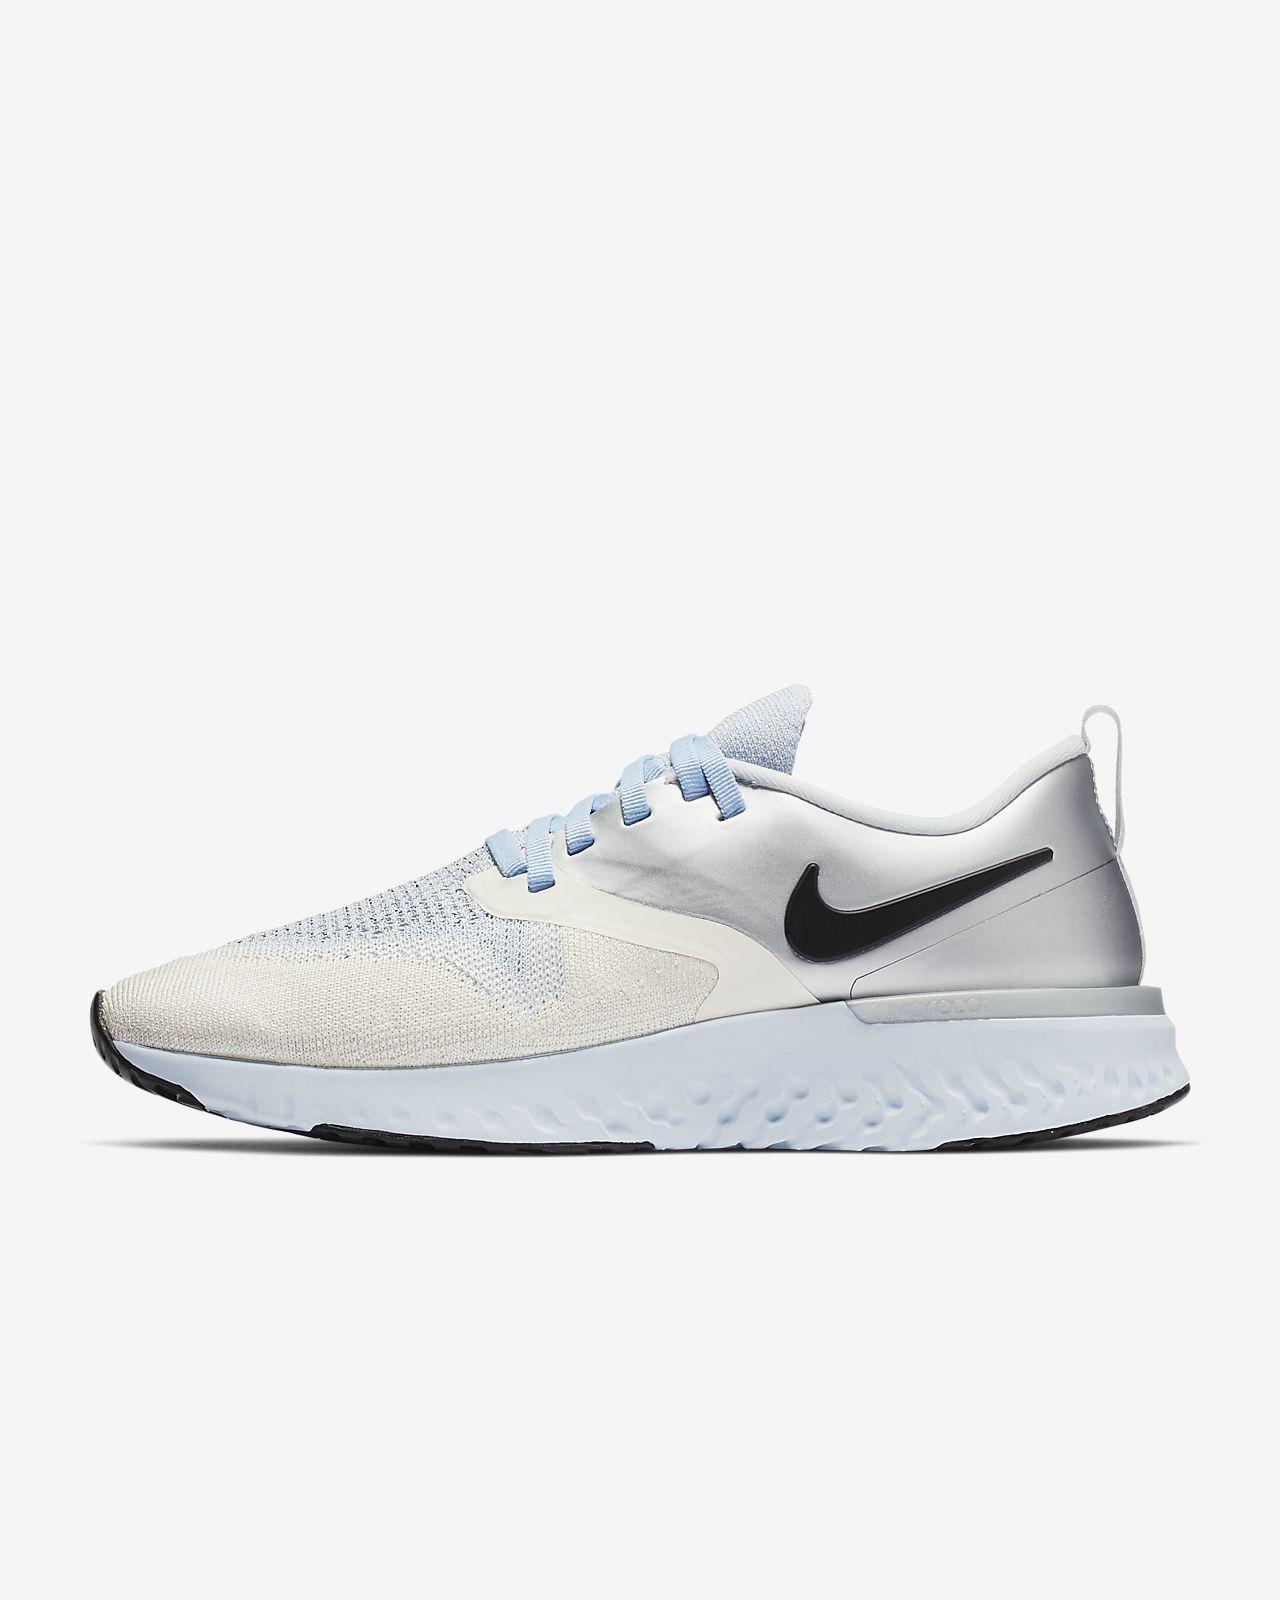 Nike Odyssey React Flyknit 2 Premium Women's Running Shoe